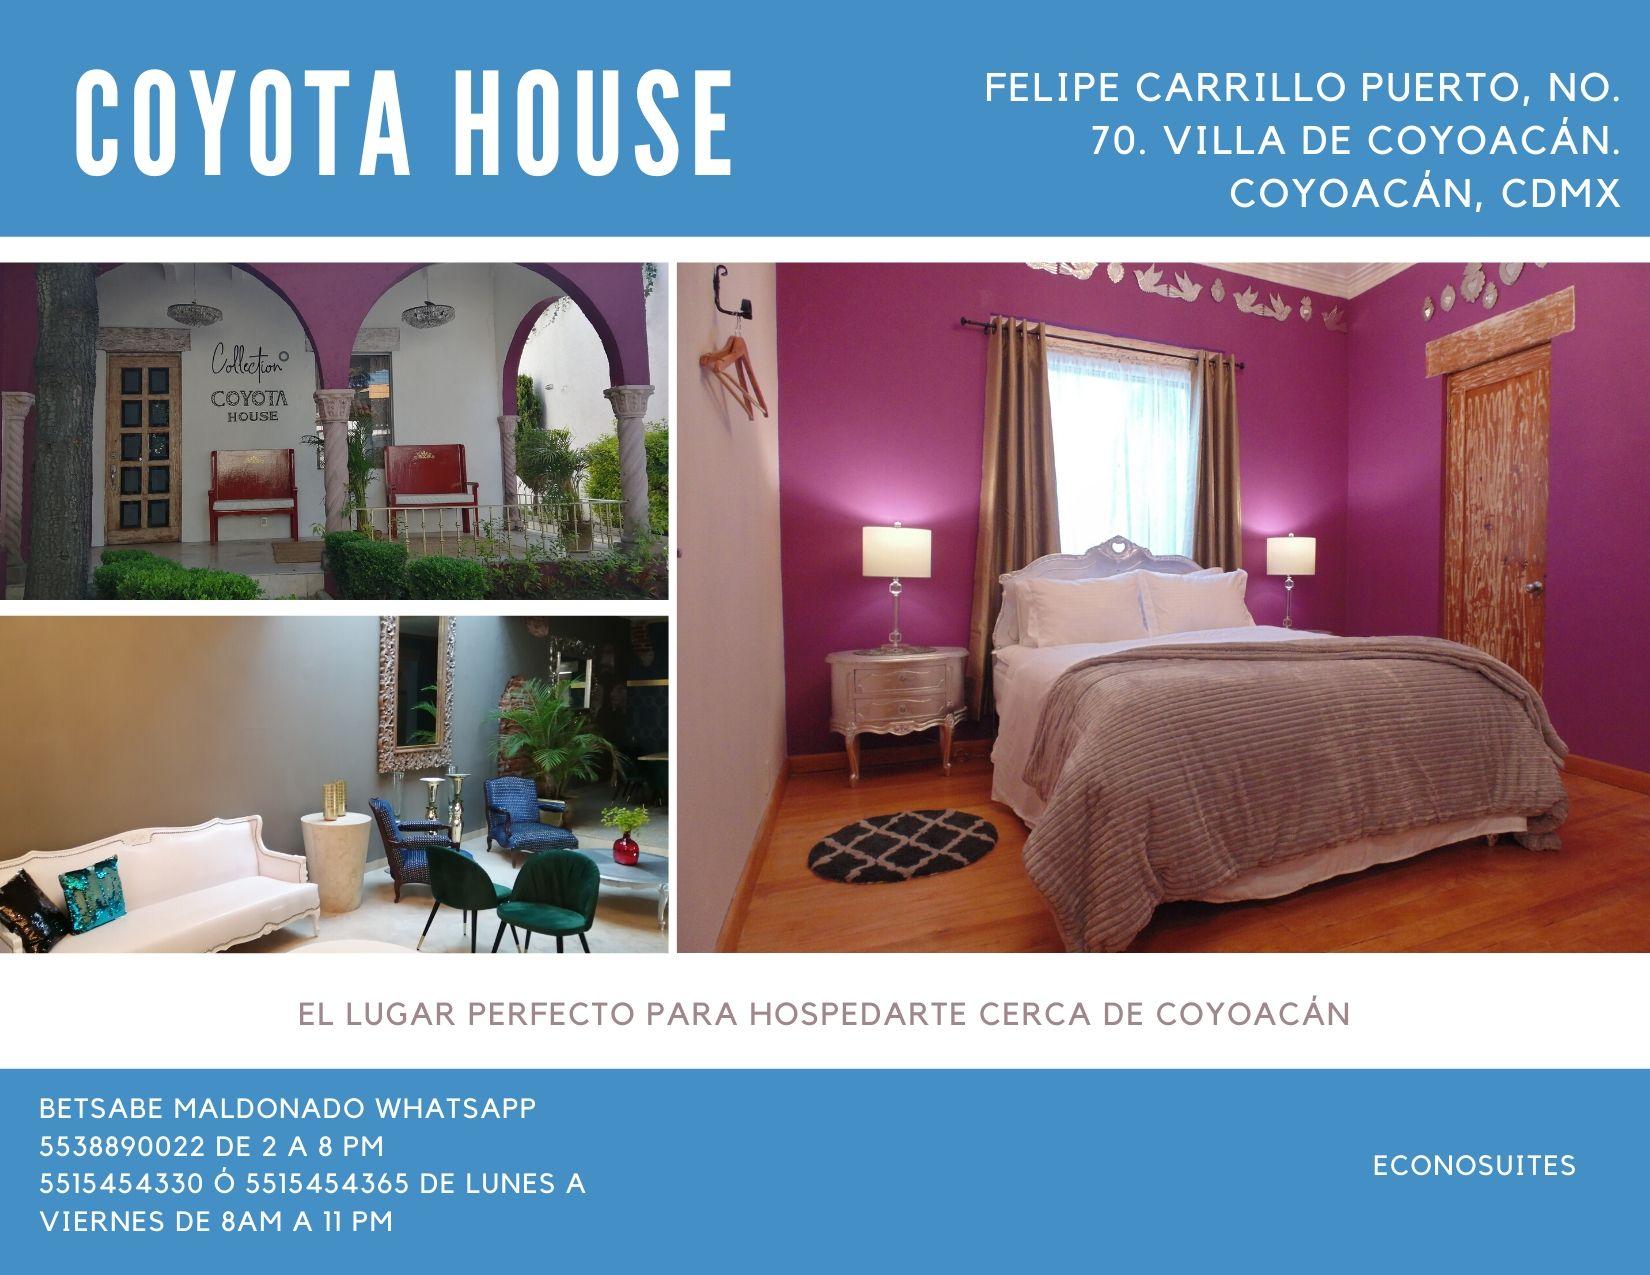 Casa Coyota